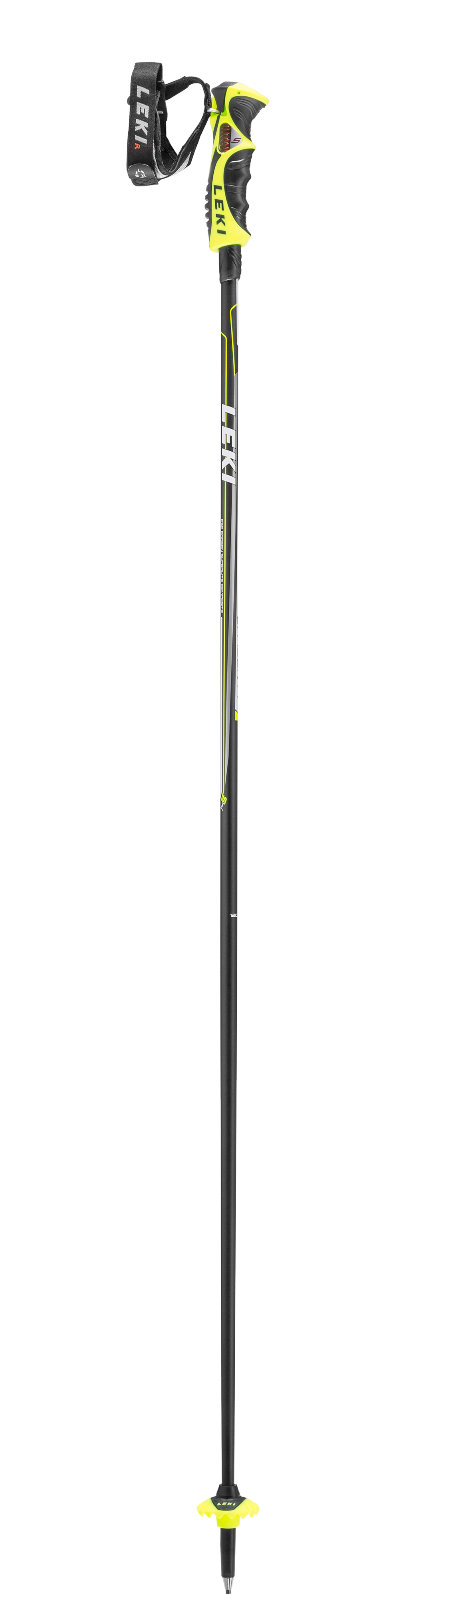 Bastoncini sci Ski Poles LEKI CARBON 14 S Neogiallo